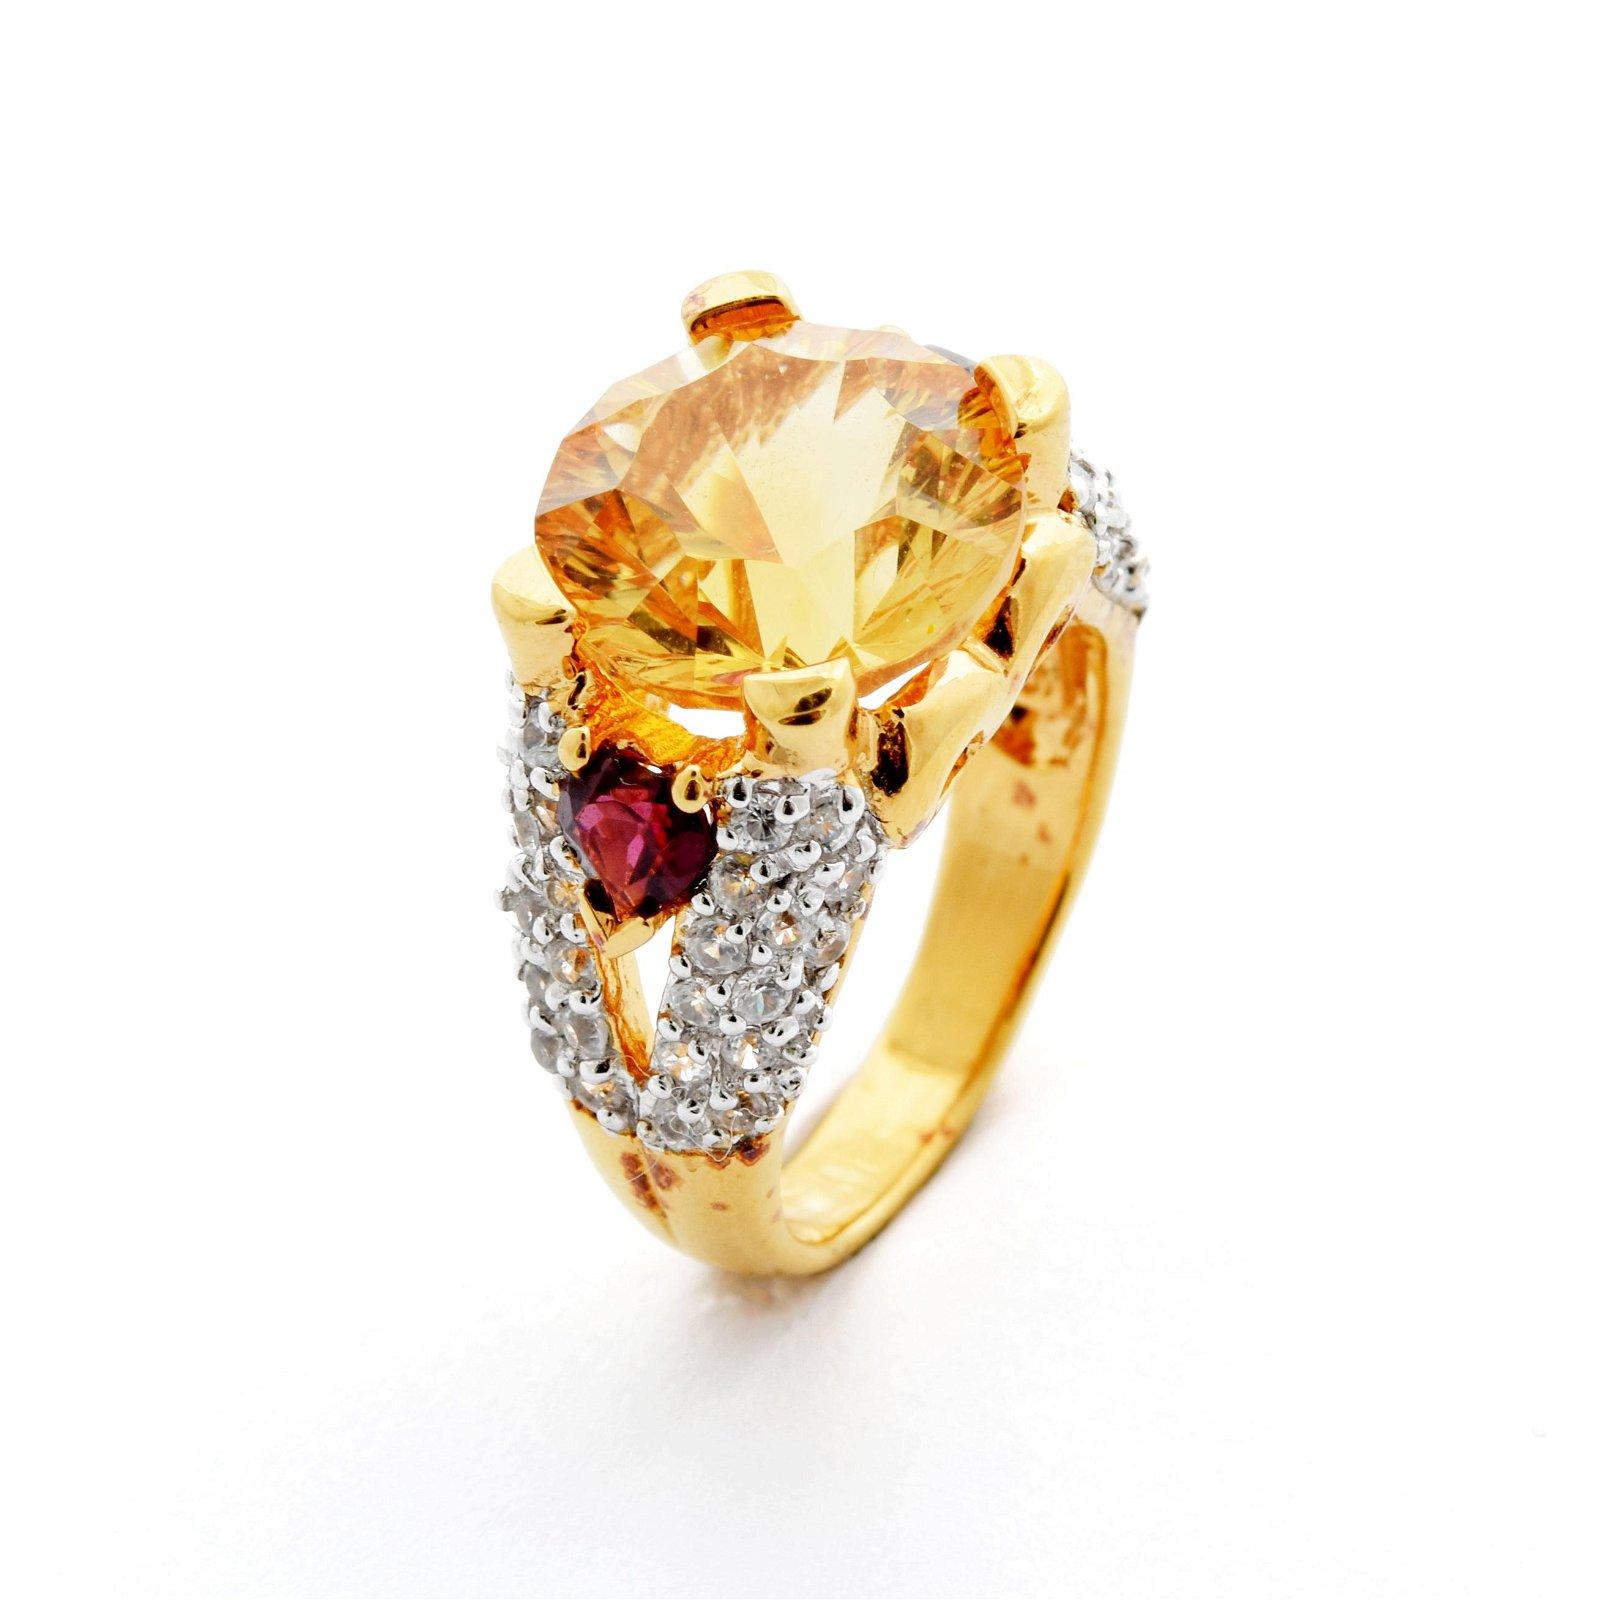 18K Gold over Silver Citrine & Garnet Ring-SZ 8